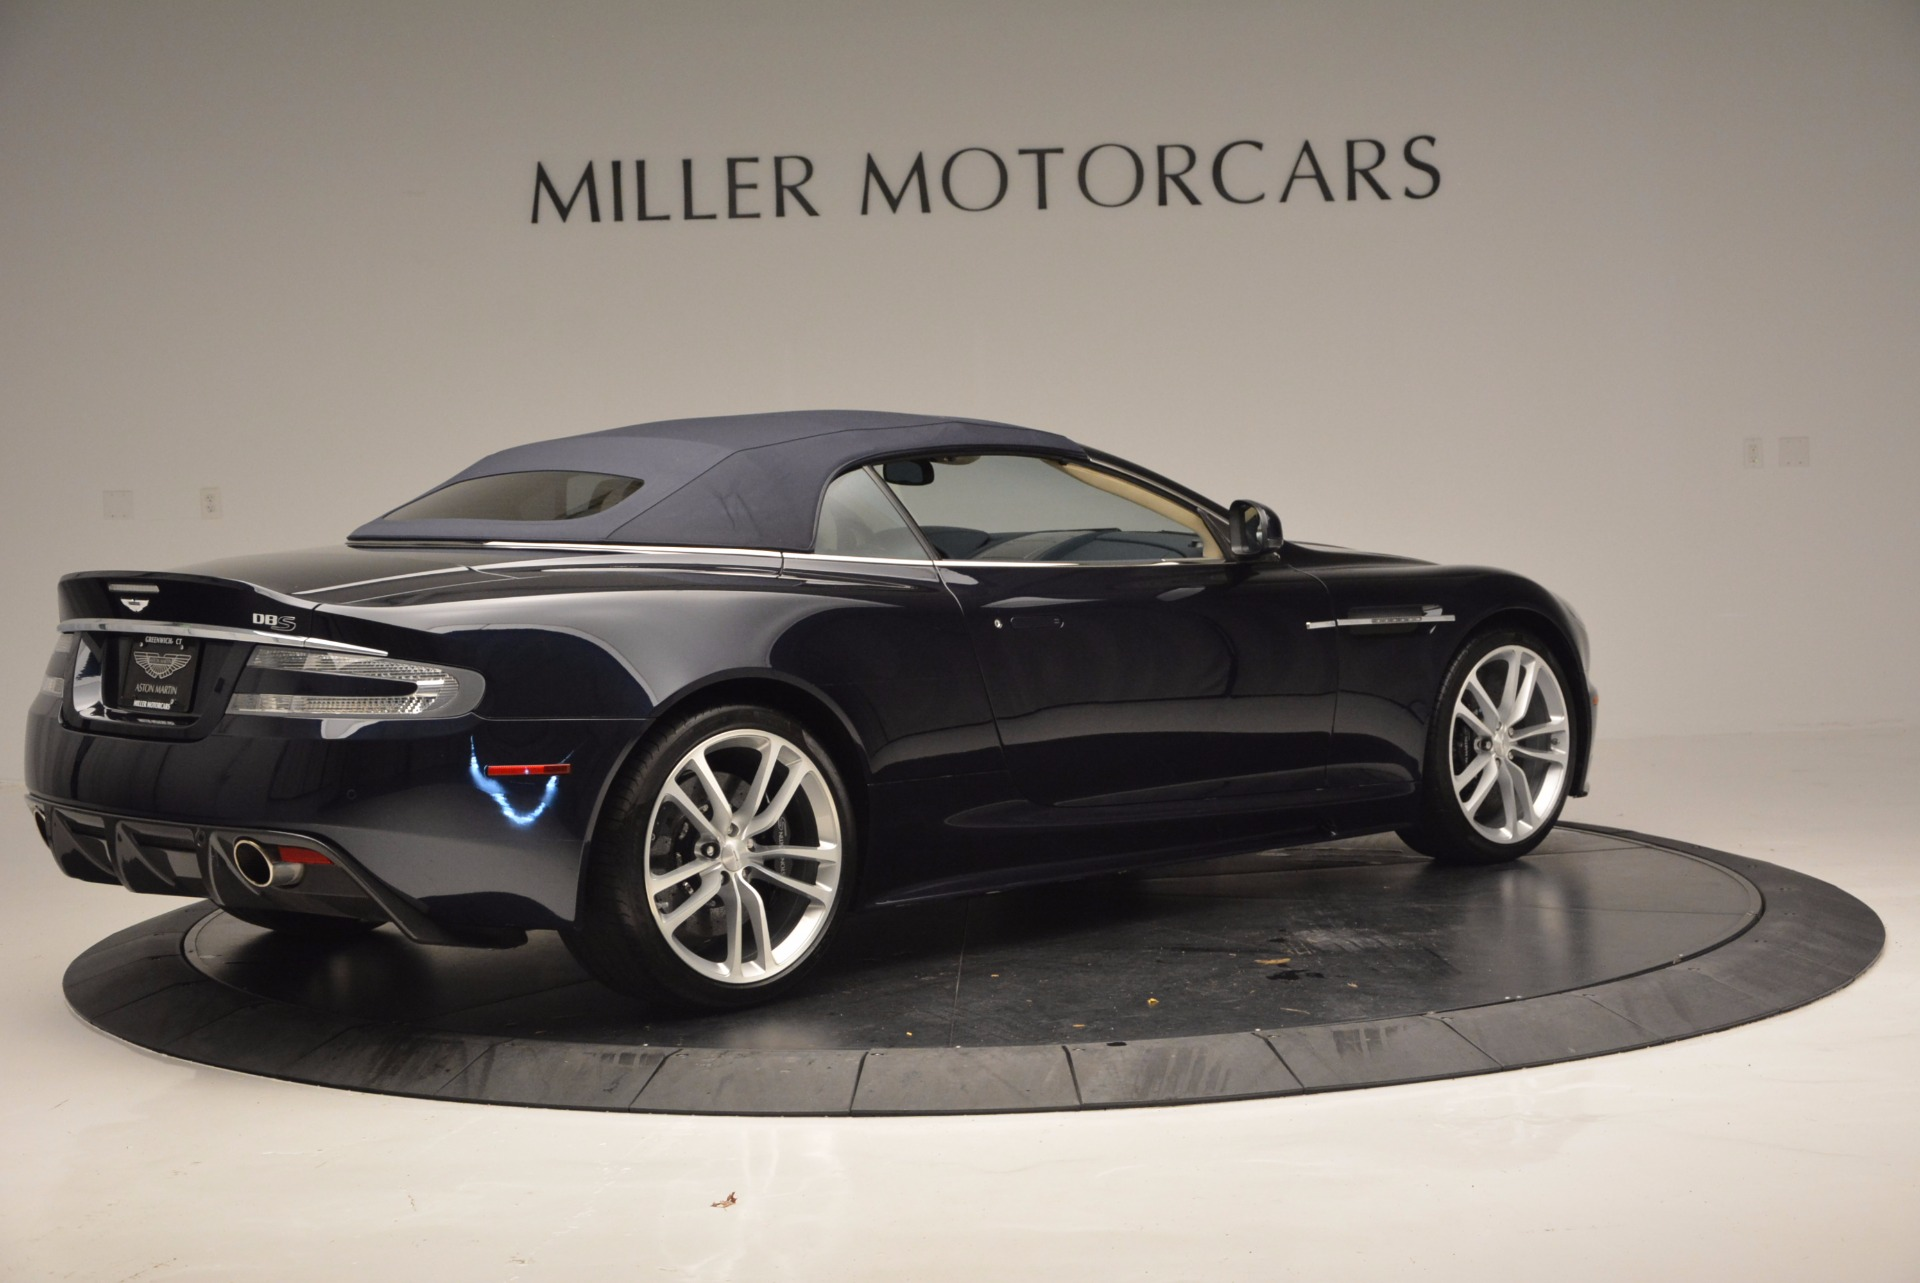 Used 2012 Aston Martin DBS Volante For Sale In Greenwich, CT 644_p20